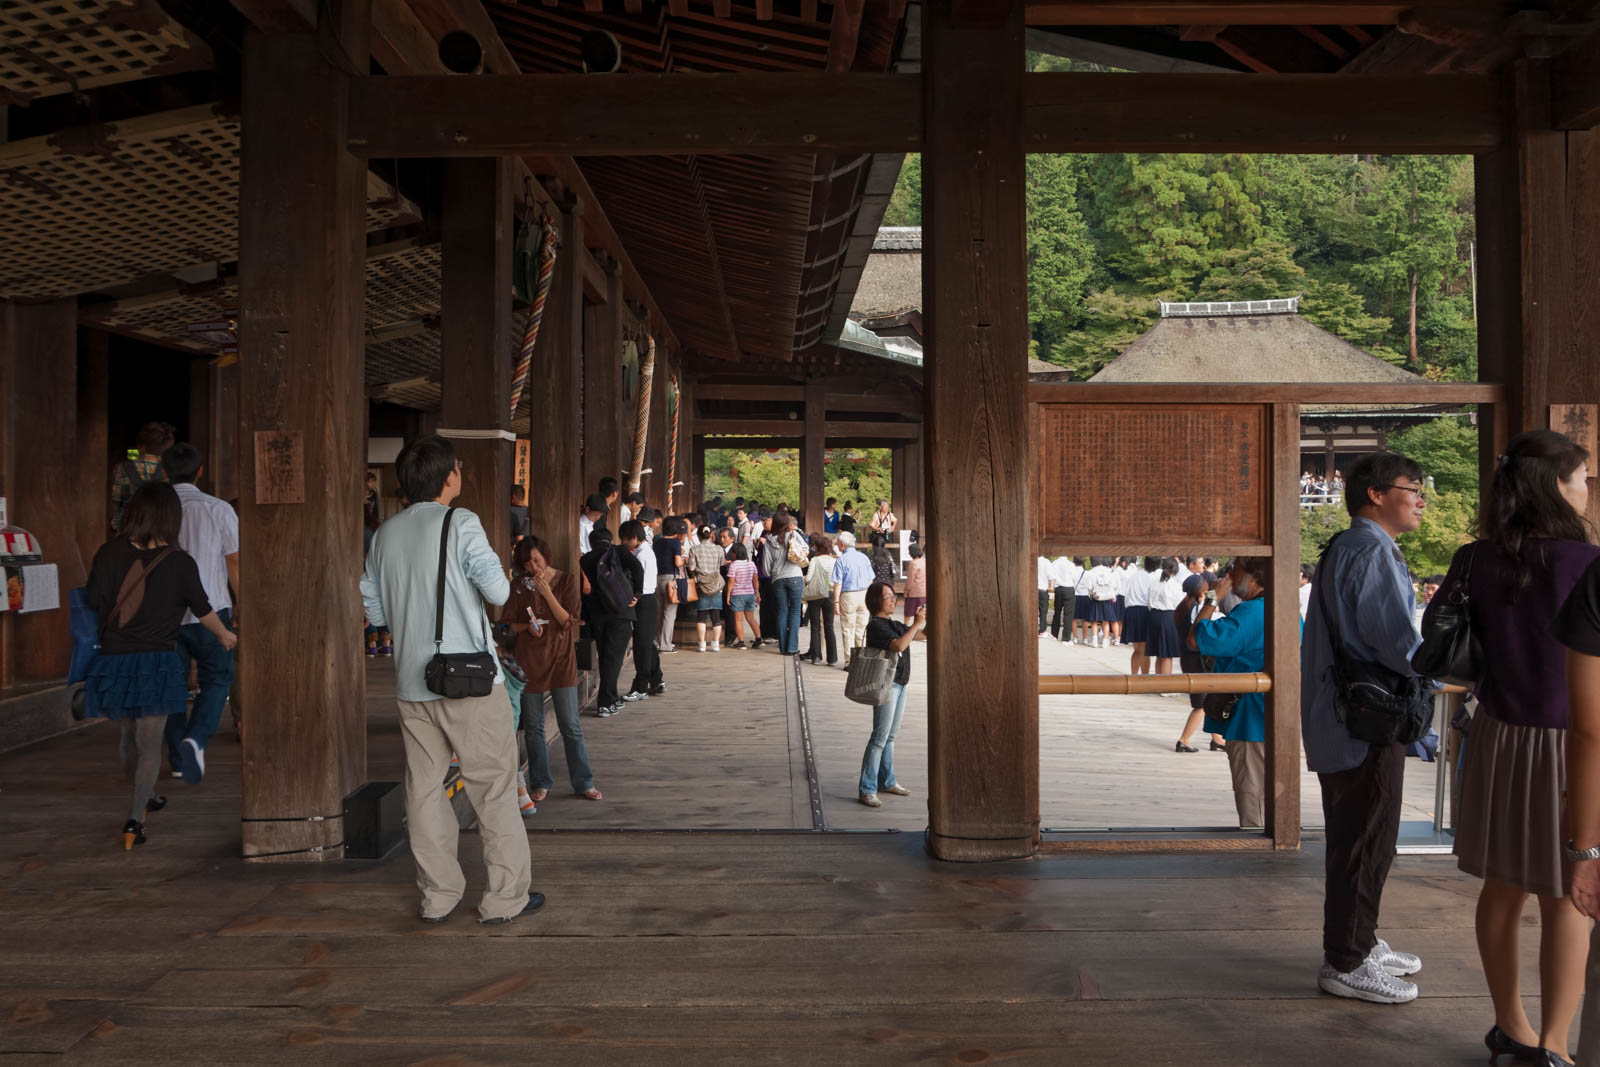 Tourists inside the Kiyomizudera temple